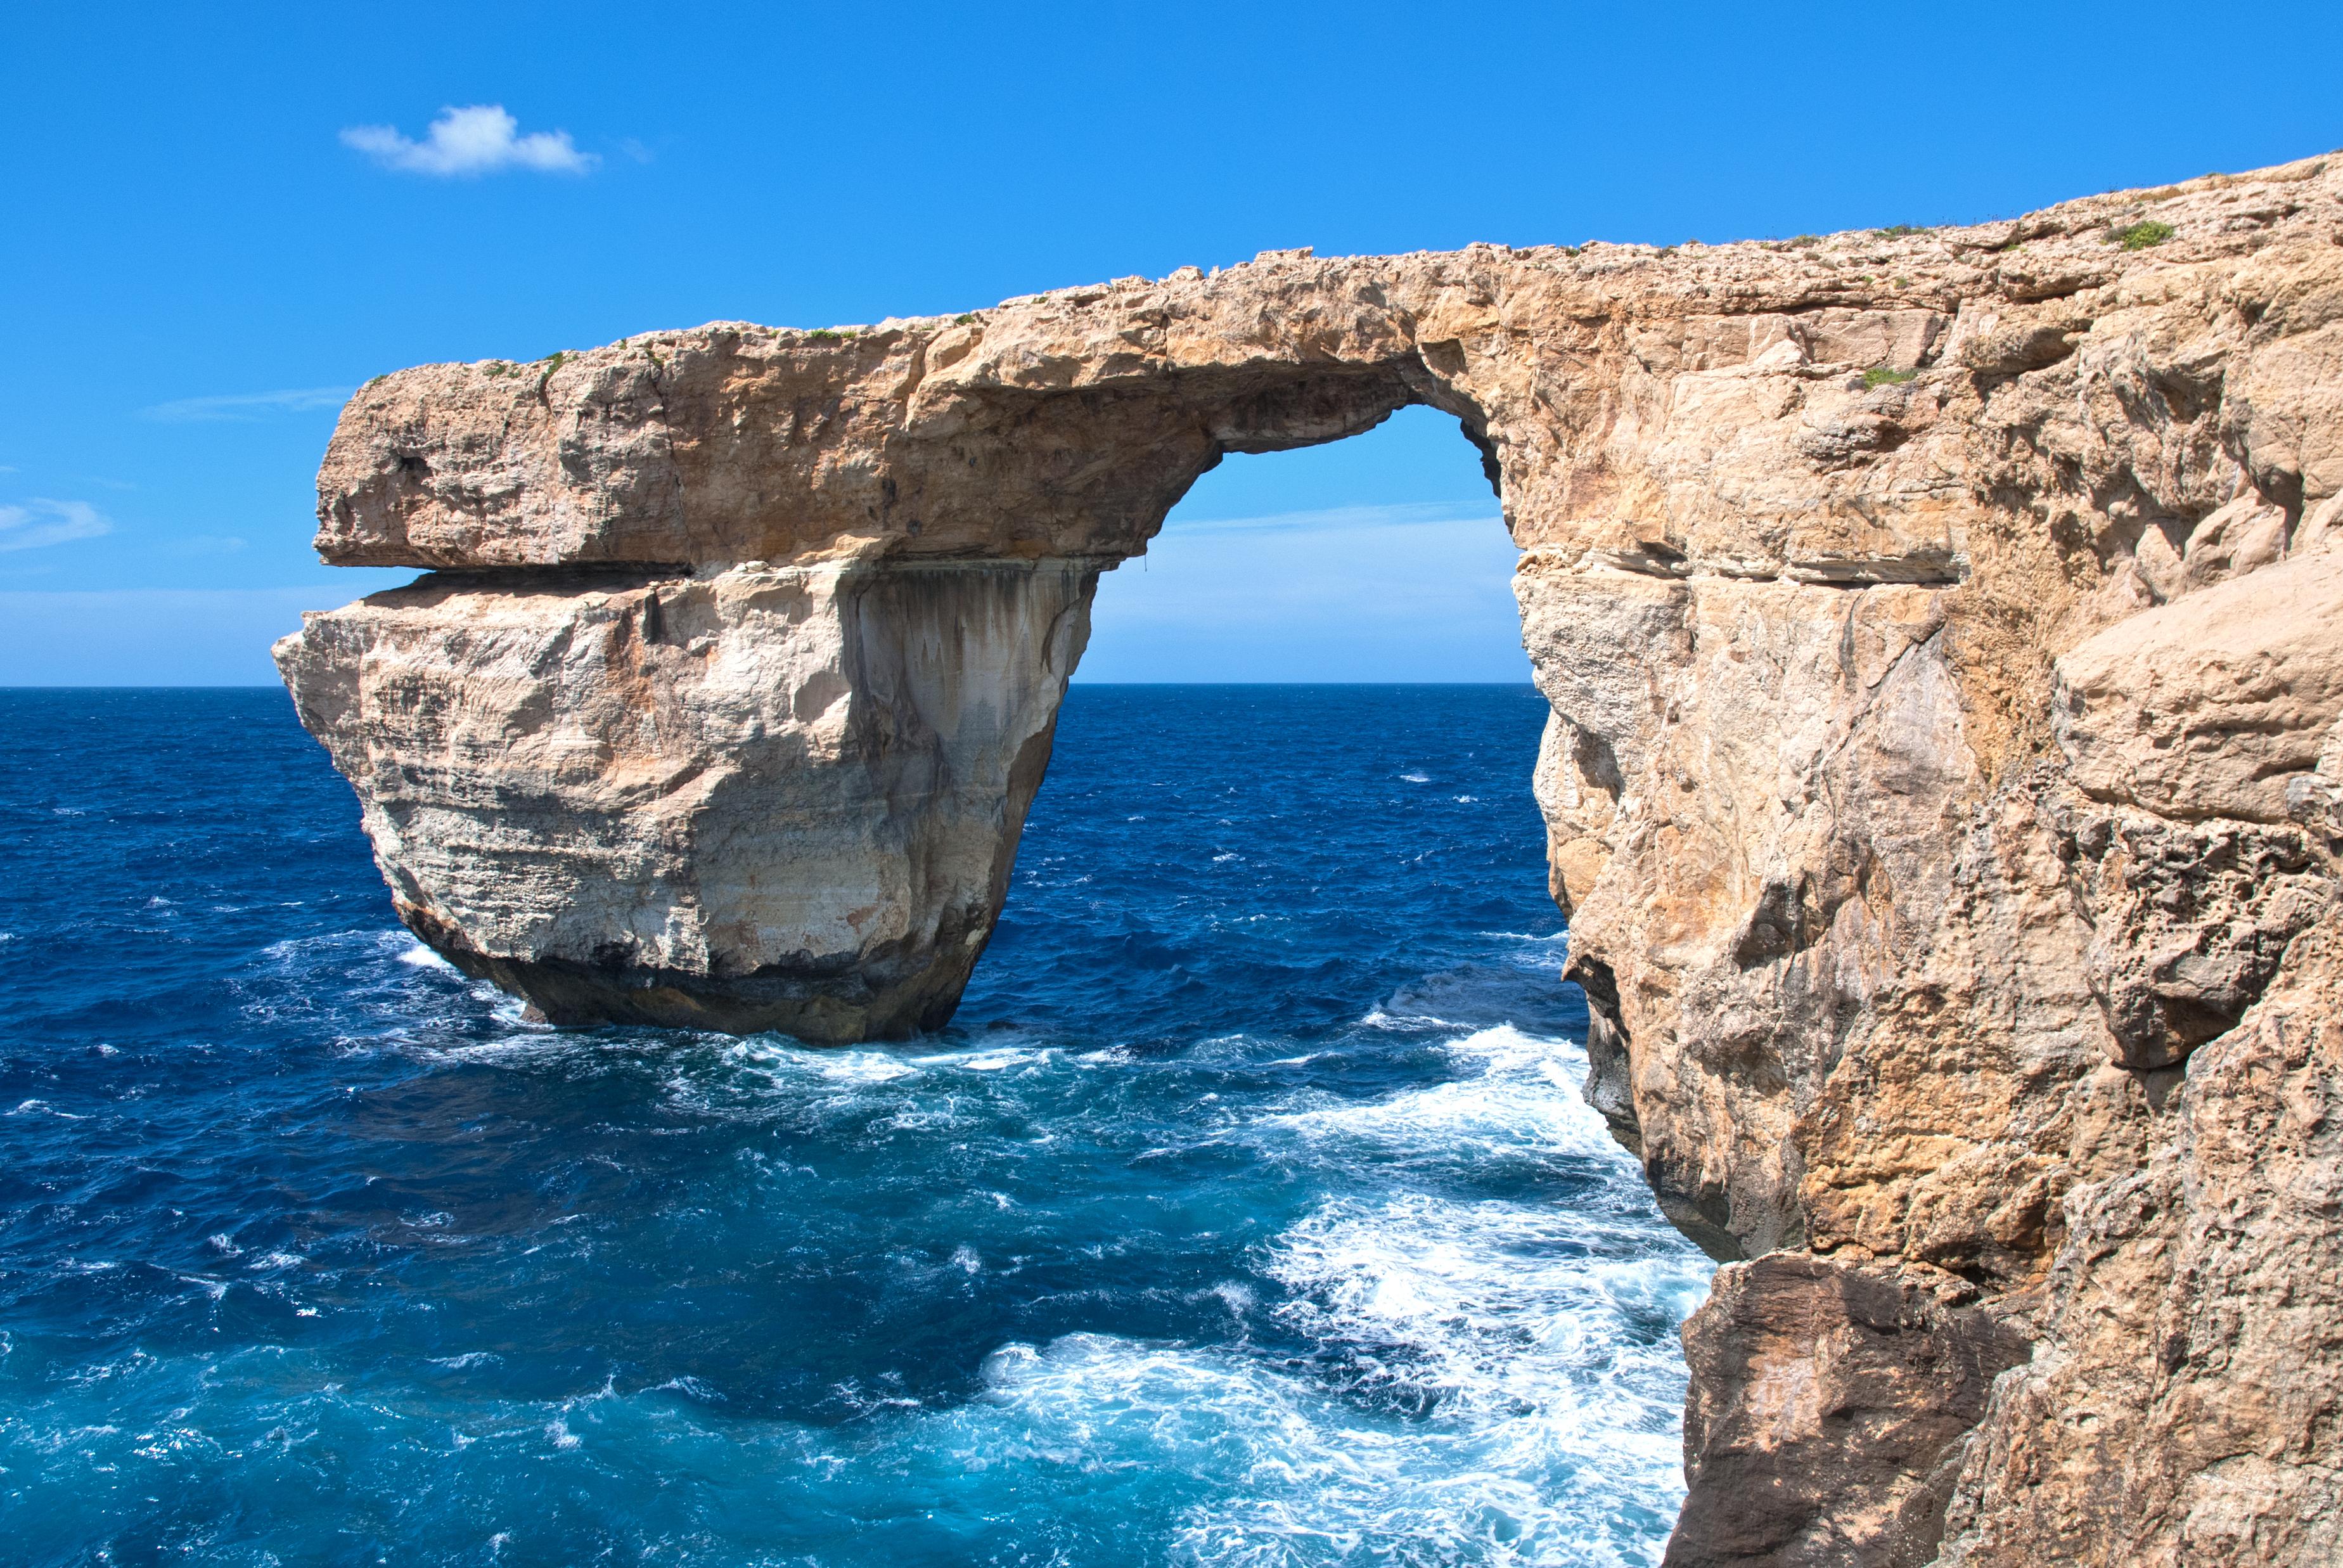 Malta_Gozo,_Azure_Window_(10264176345).jpg